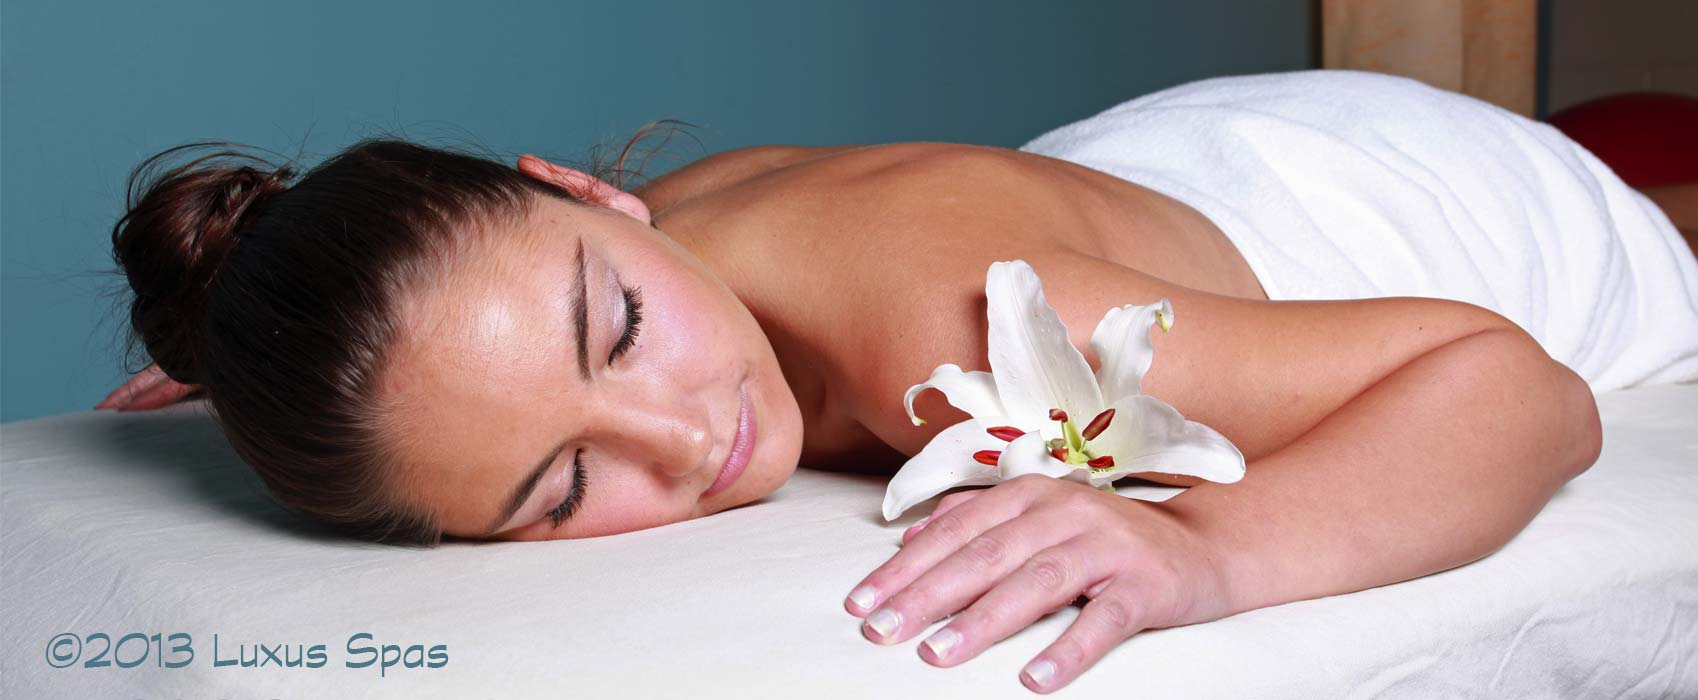 Luxus Spas Luxury Spa Search